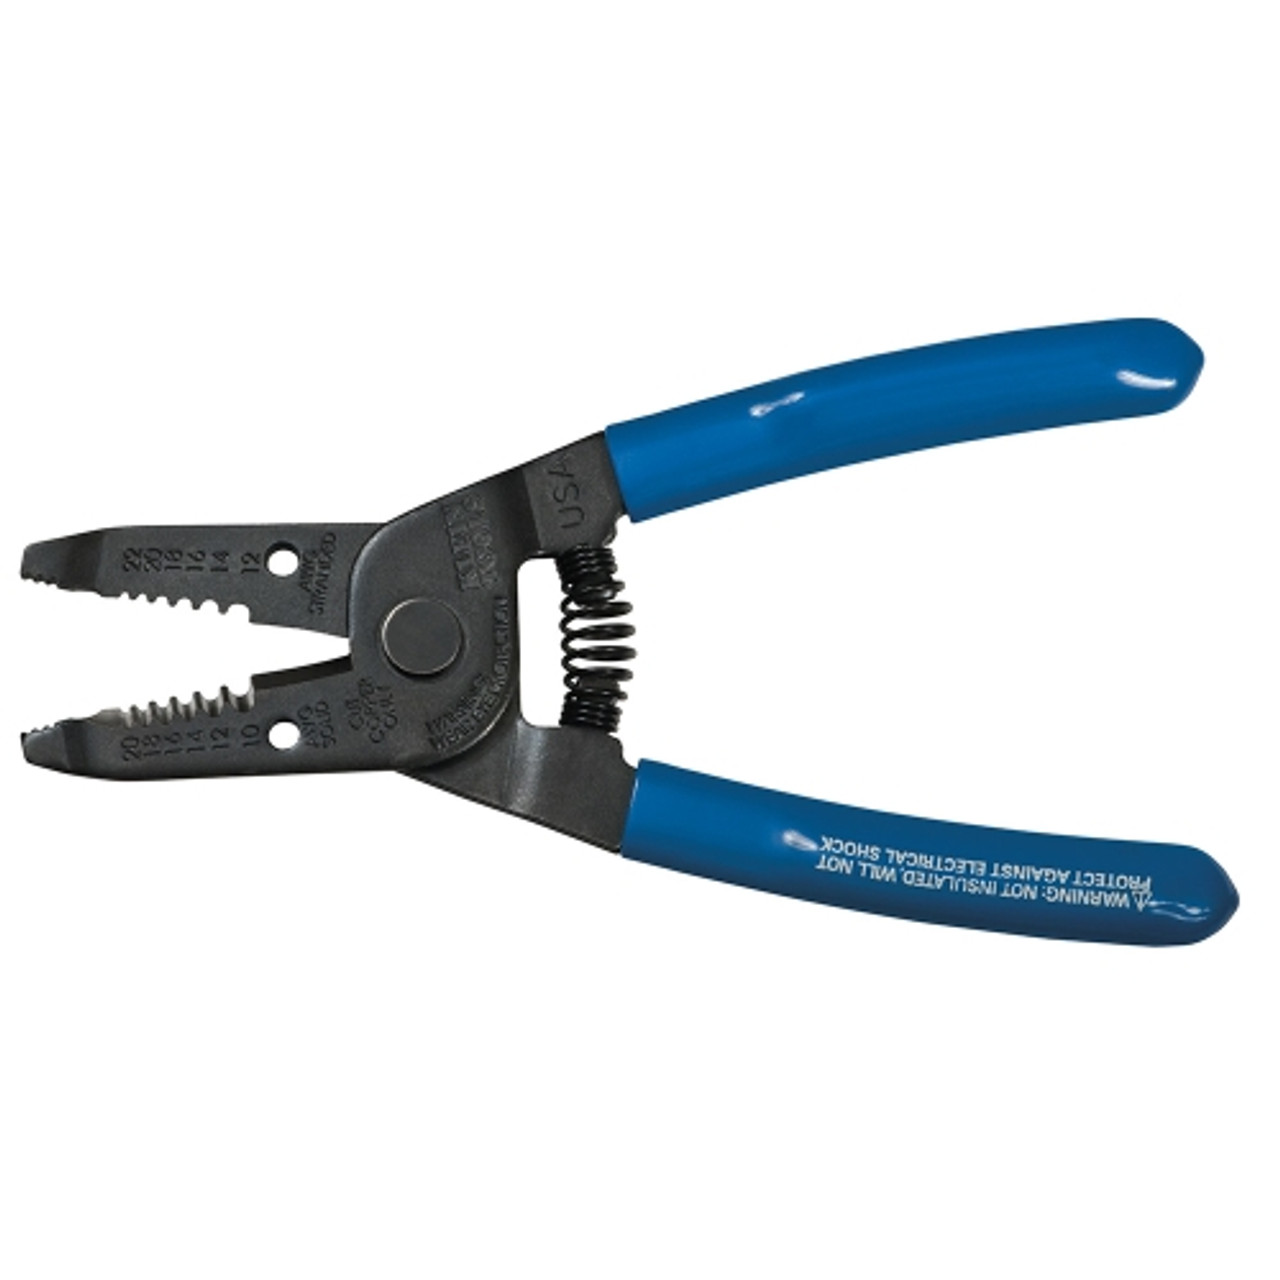 Klein 1011 Multi-Purpose Wire Stripper/Cutter